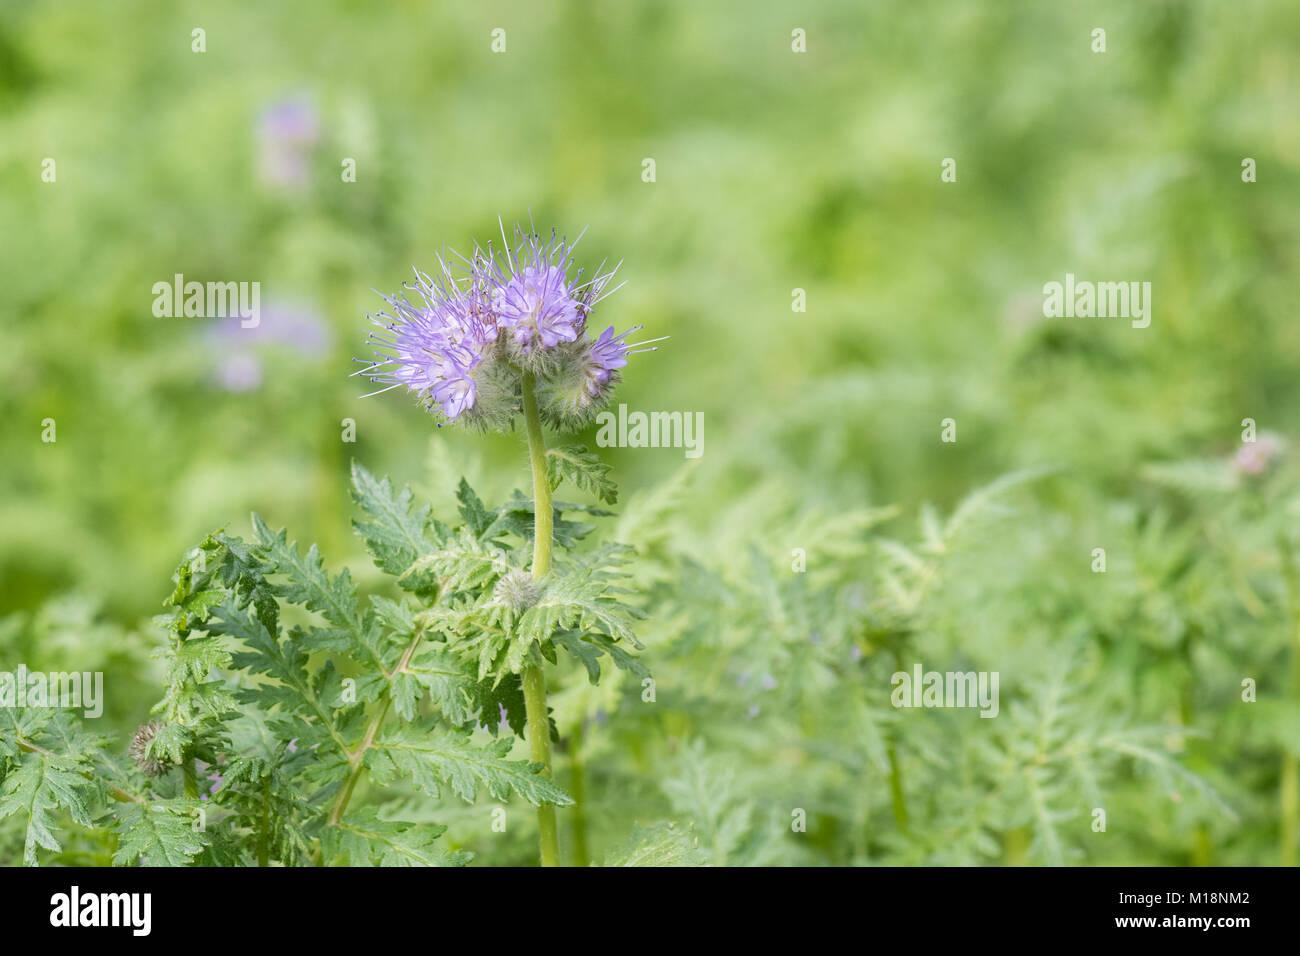 phacelia tanacetifolia - Scorpion Weed or Fiddleneck - growing in UK as green manure Stock Photo